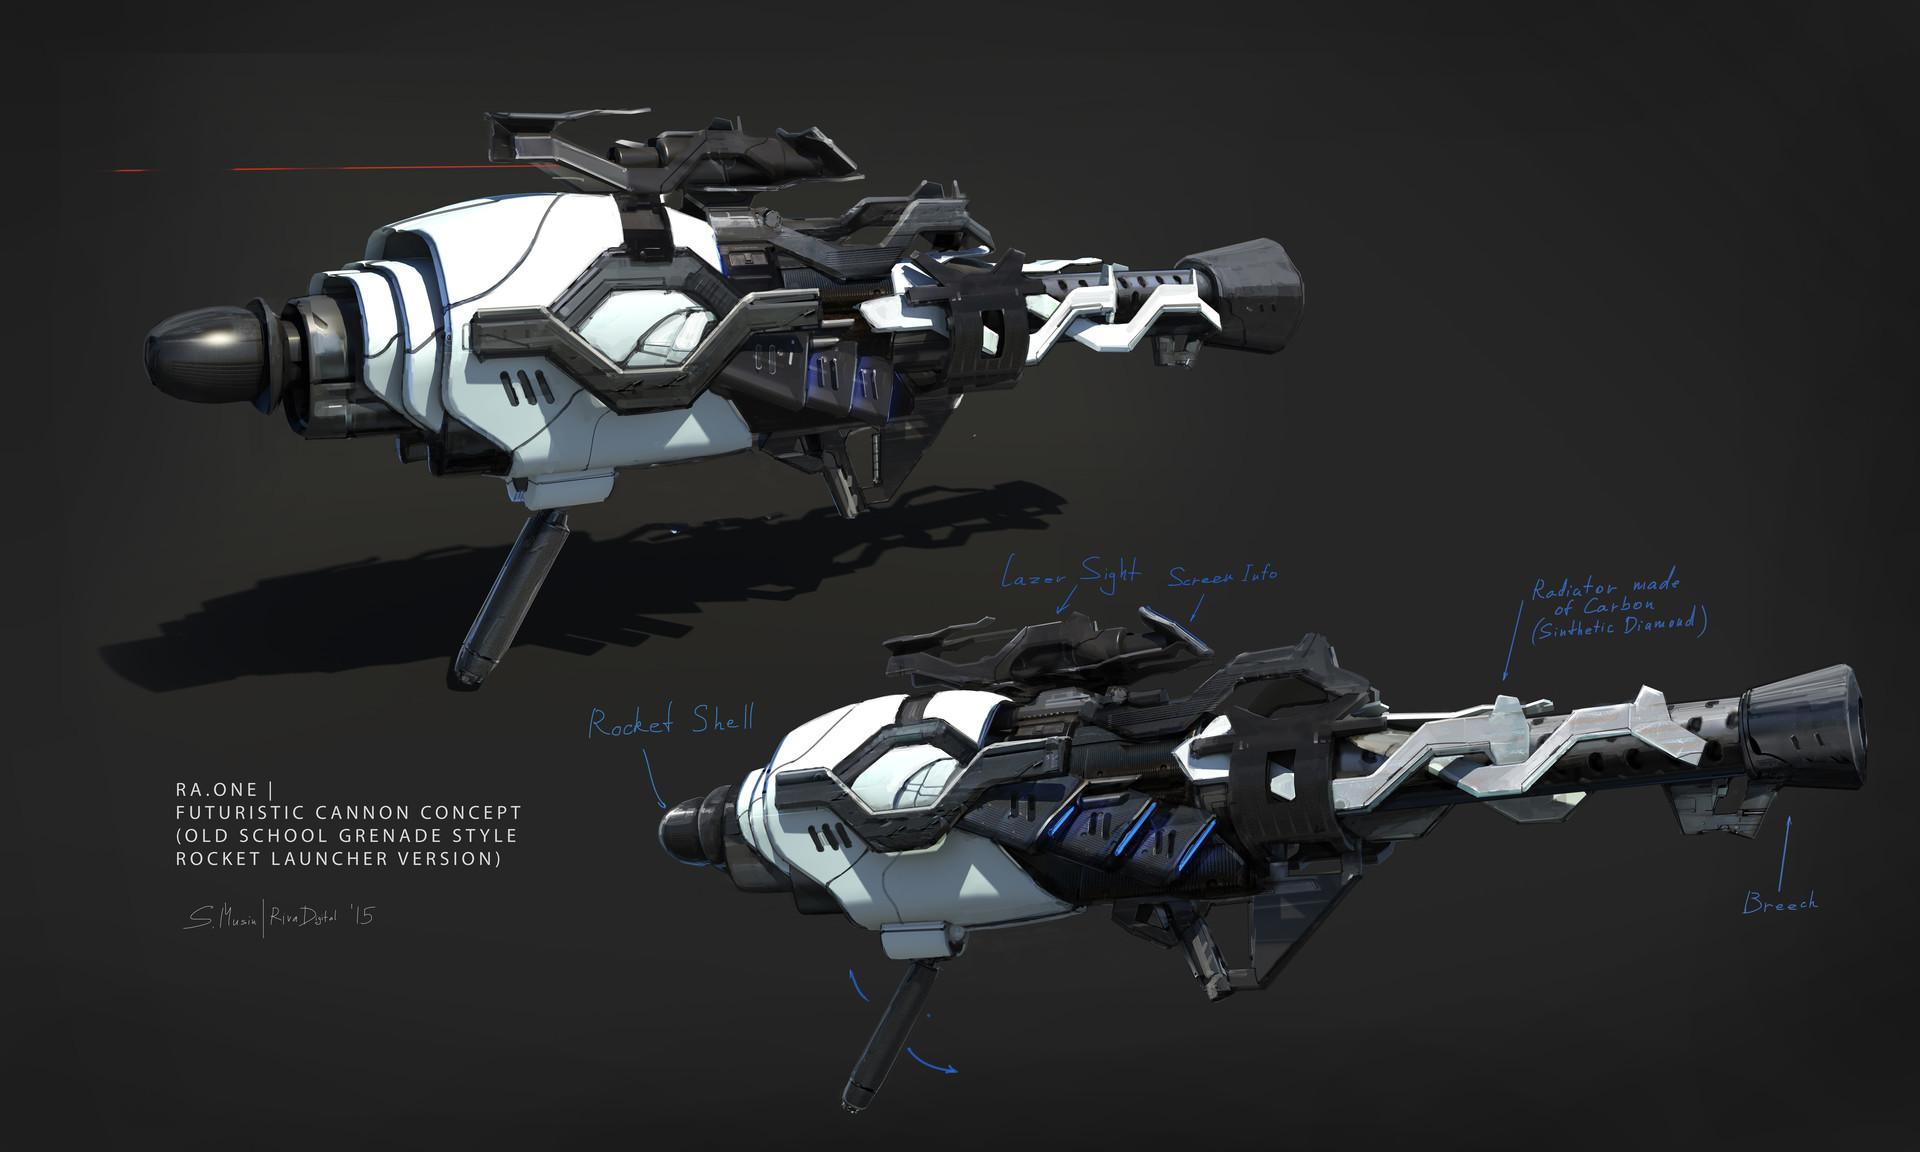 Sergey musin sergey musin futuristic cannon concept 09 rocketgrenade